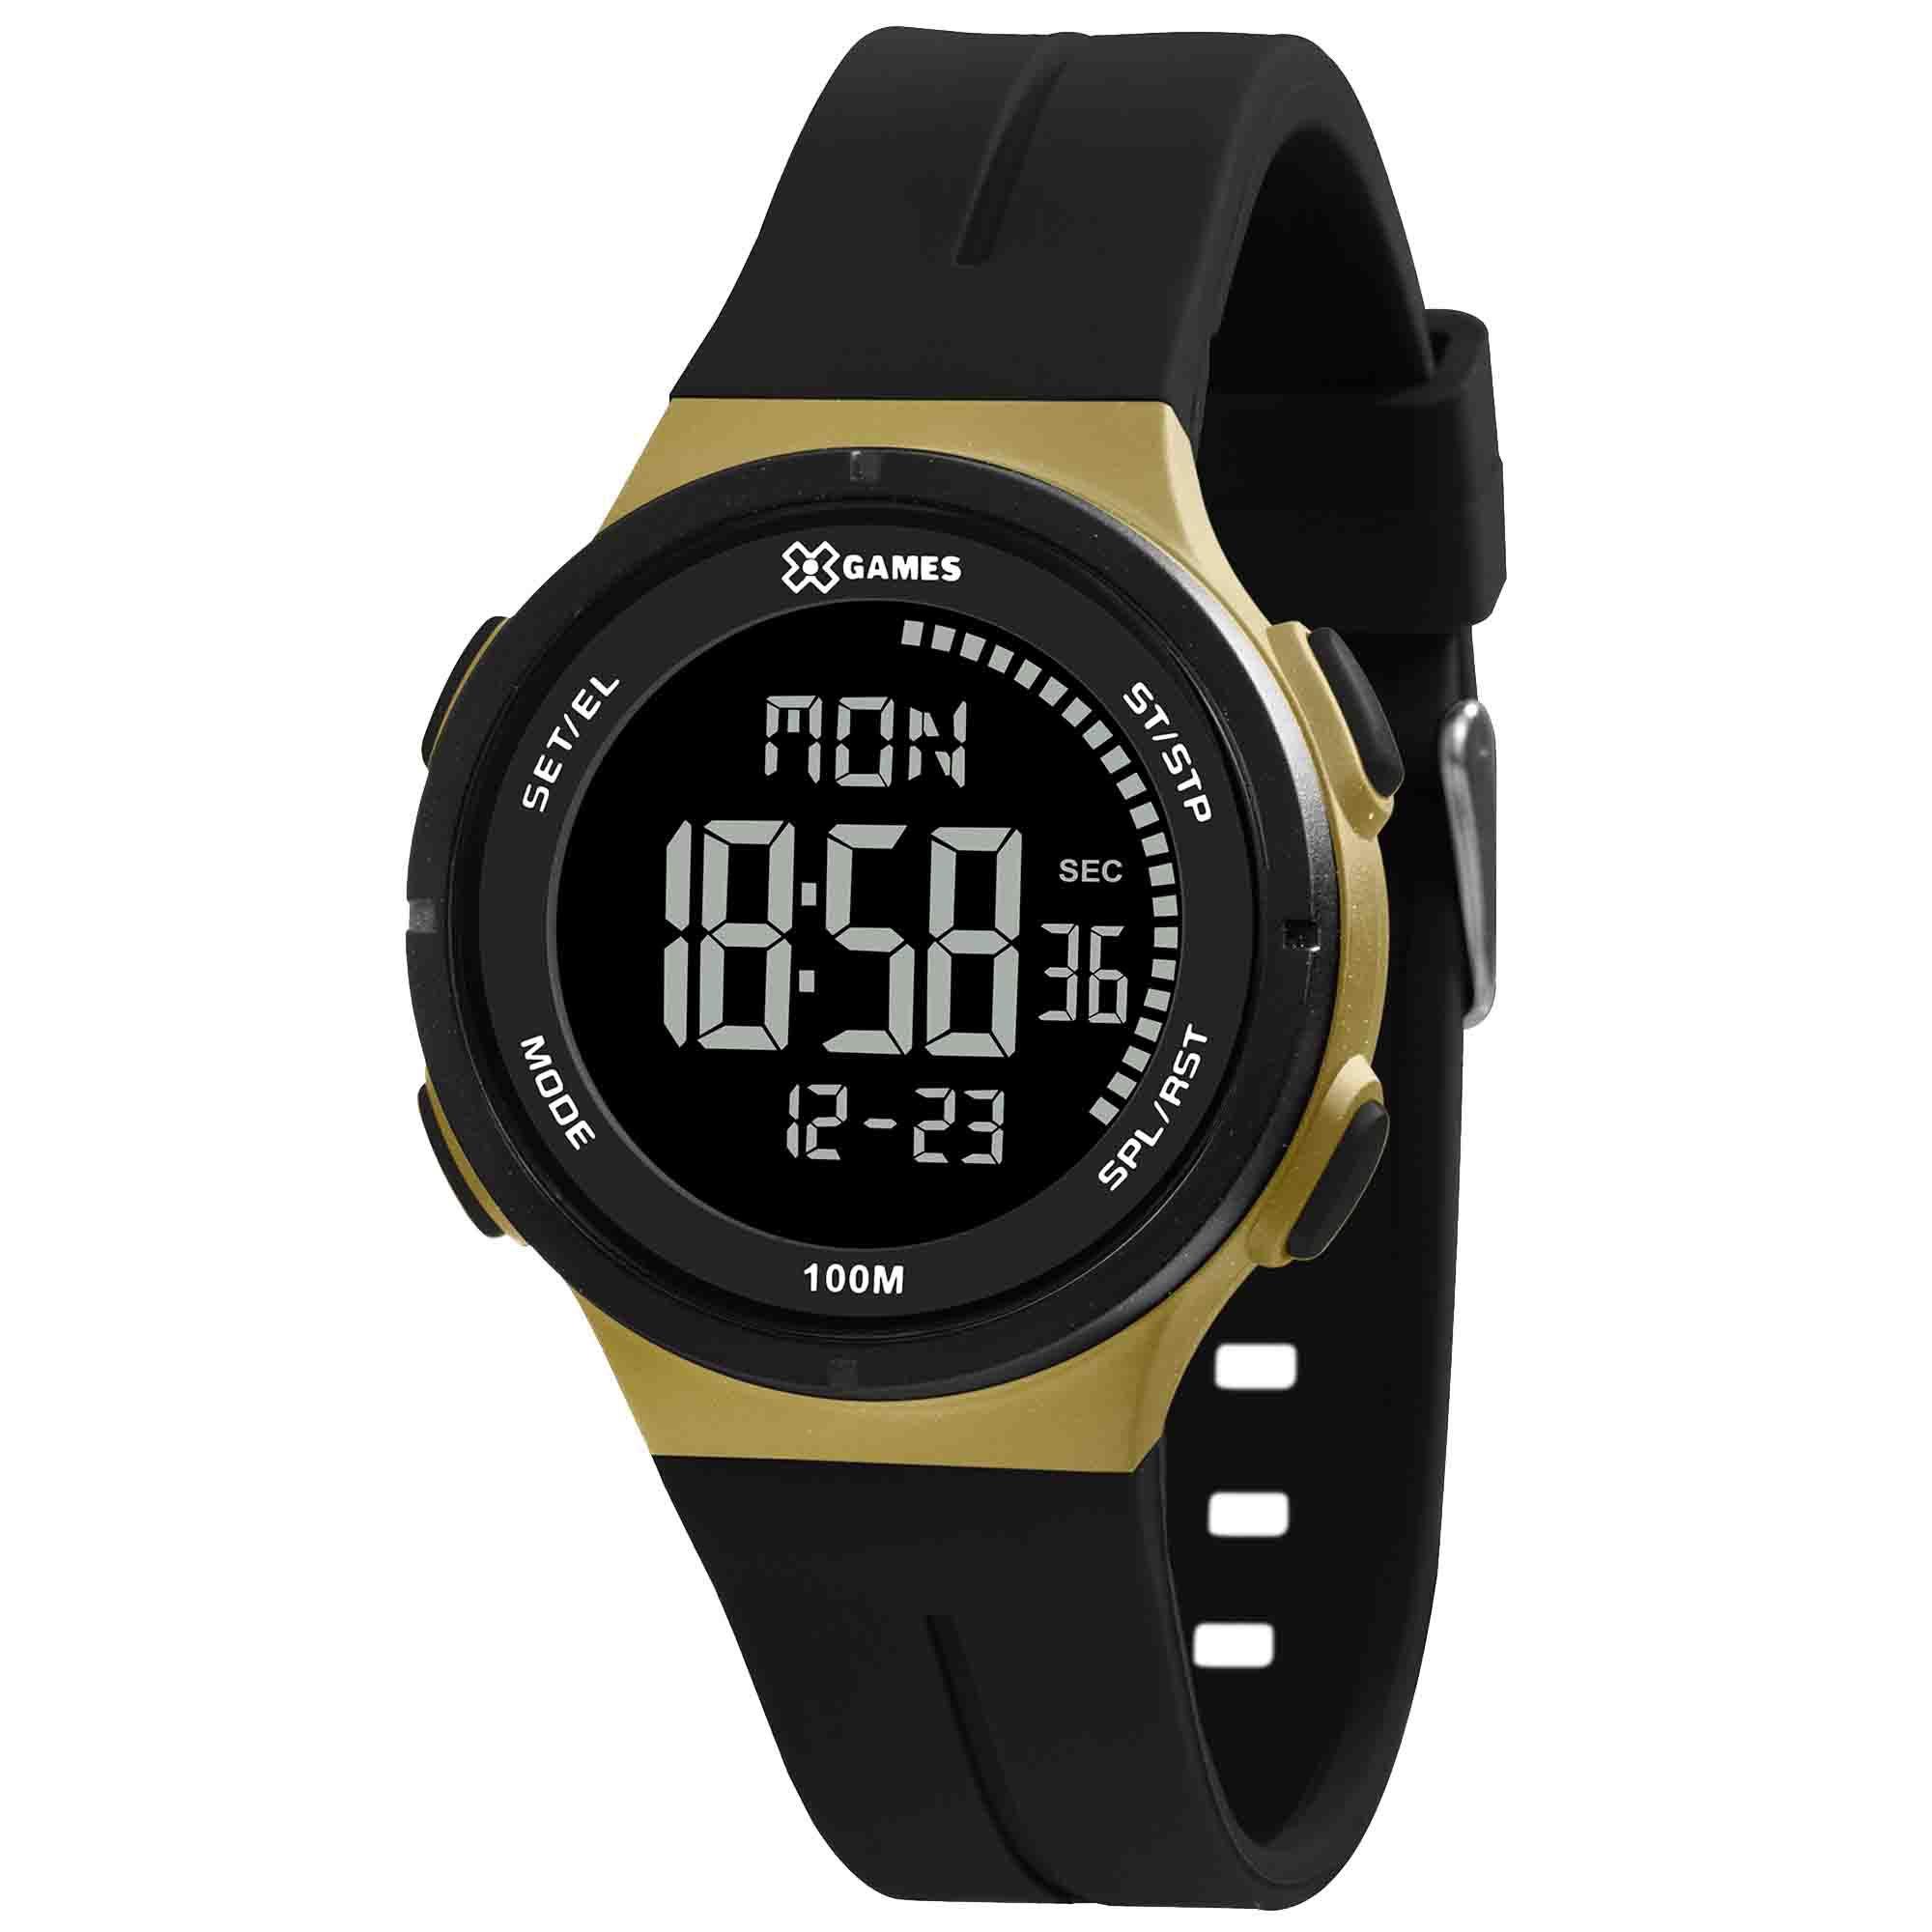 Relógio Masculino X Games XMPPD579 PXPX